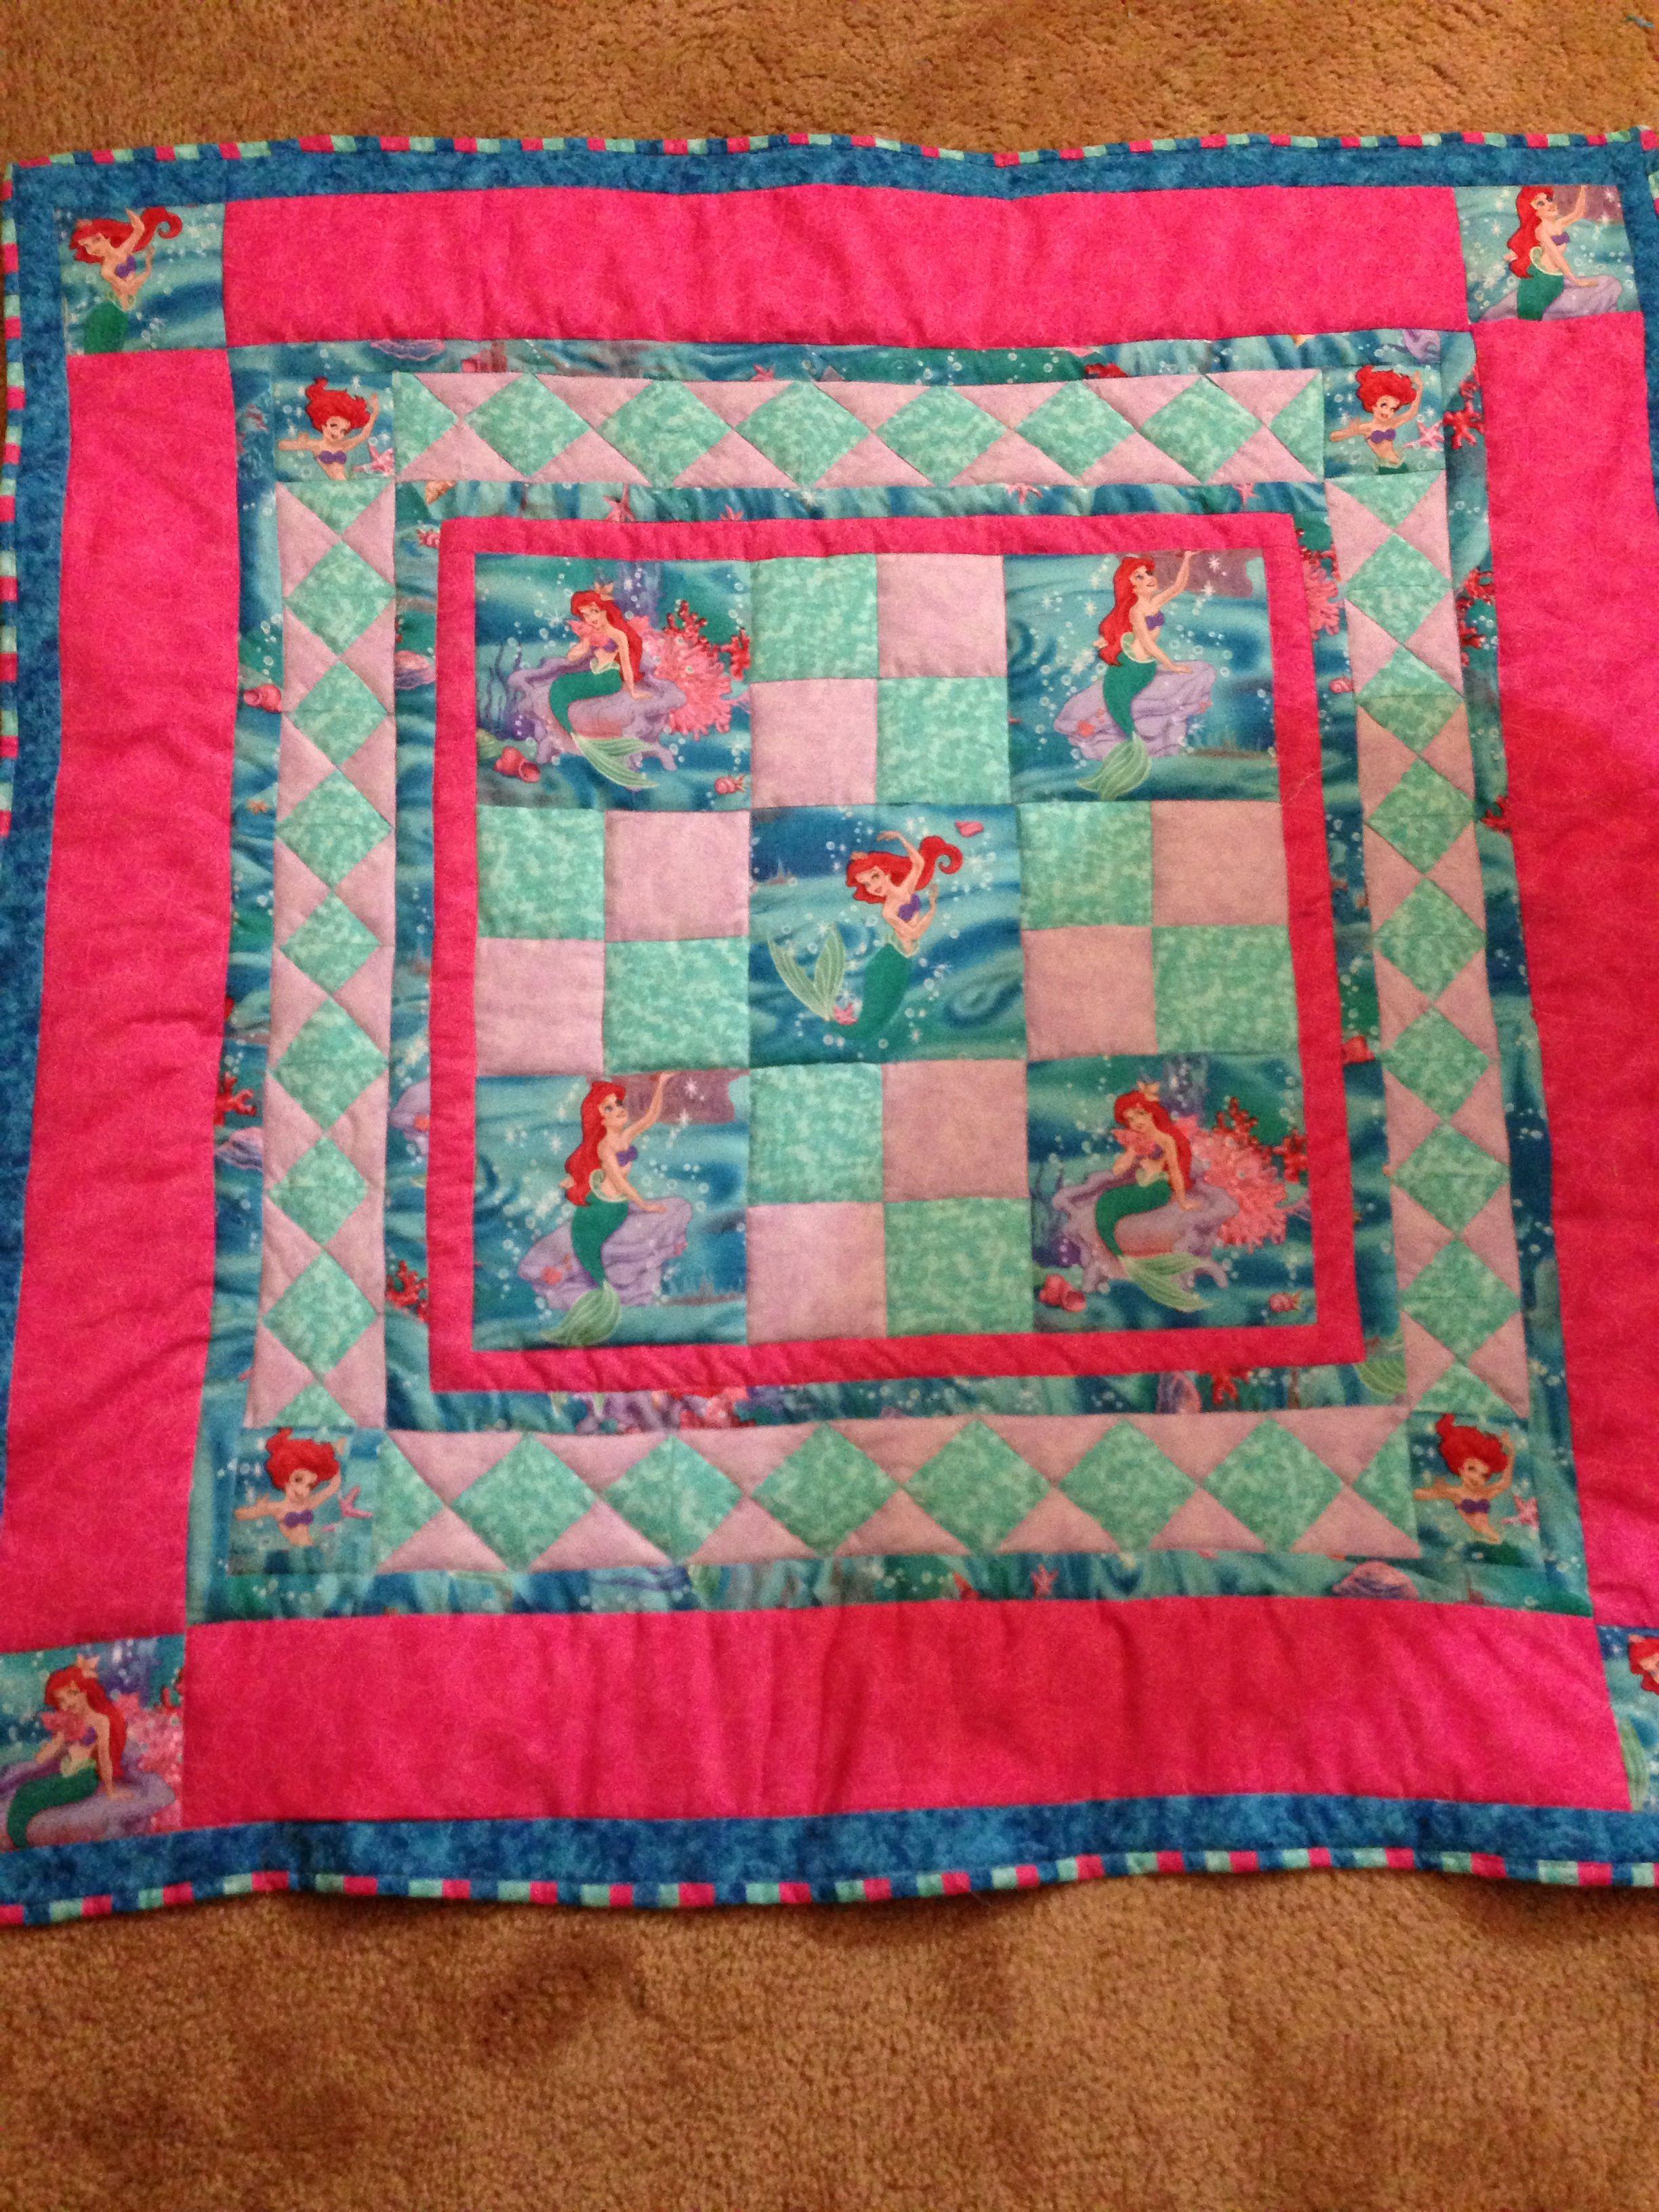 Little Mermaid Quilt Quilts Pinterest Mermaid Quilt